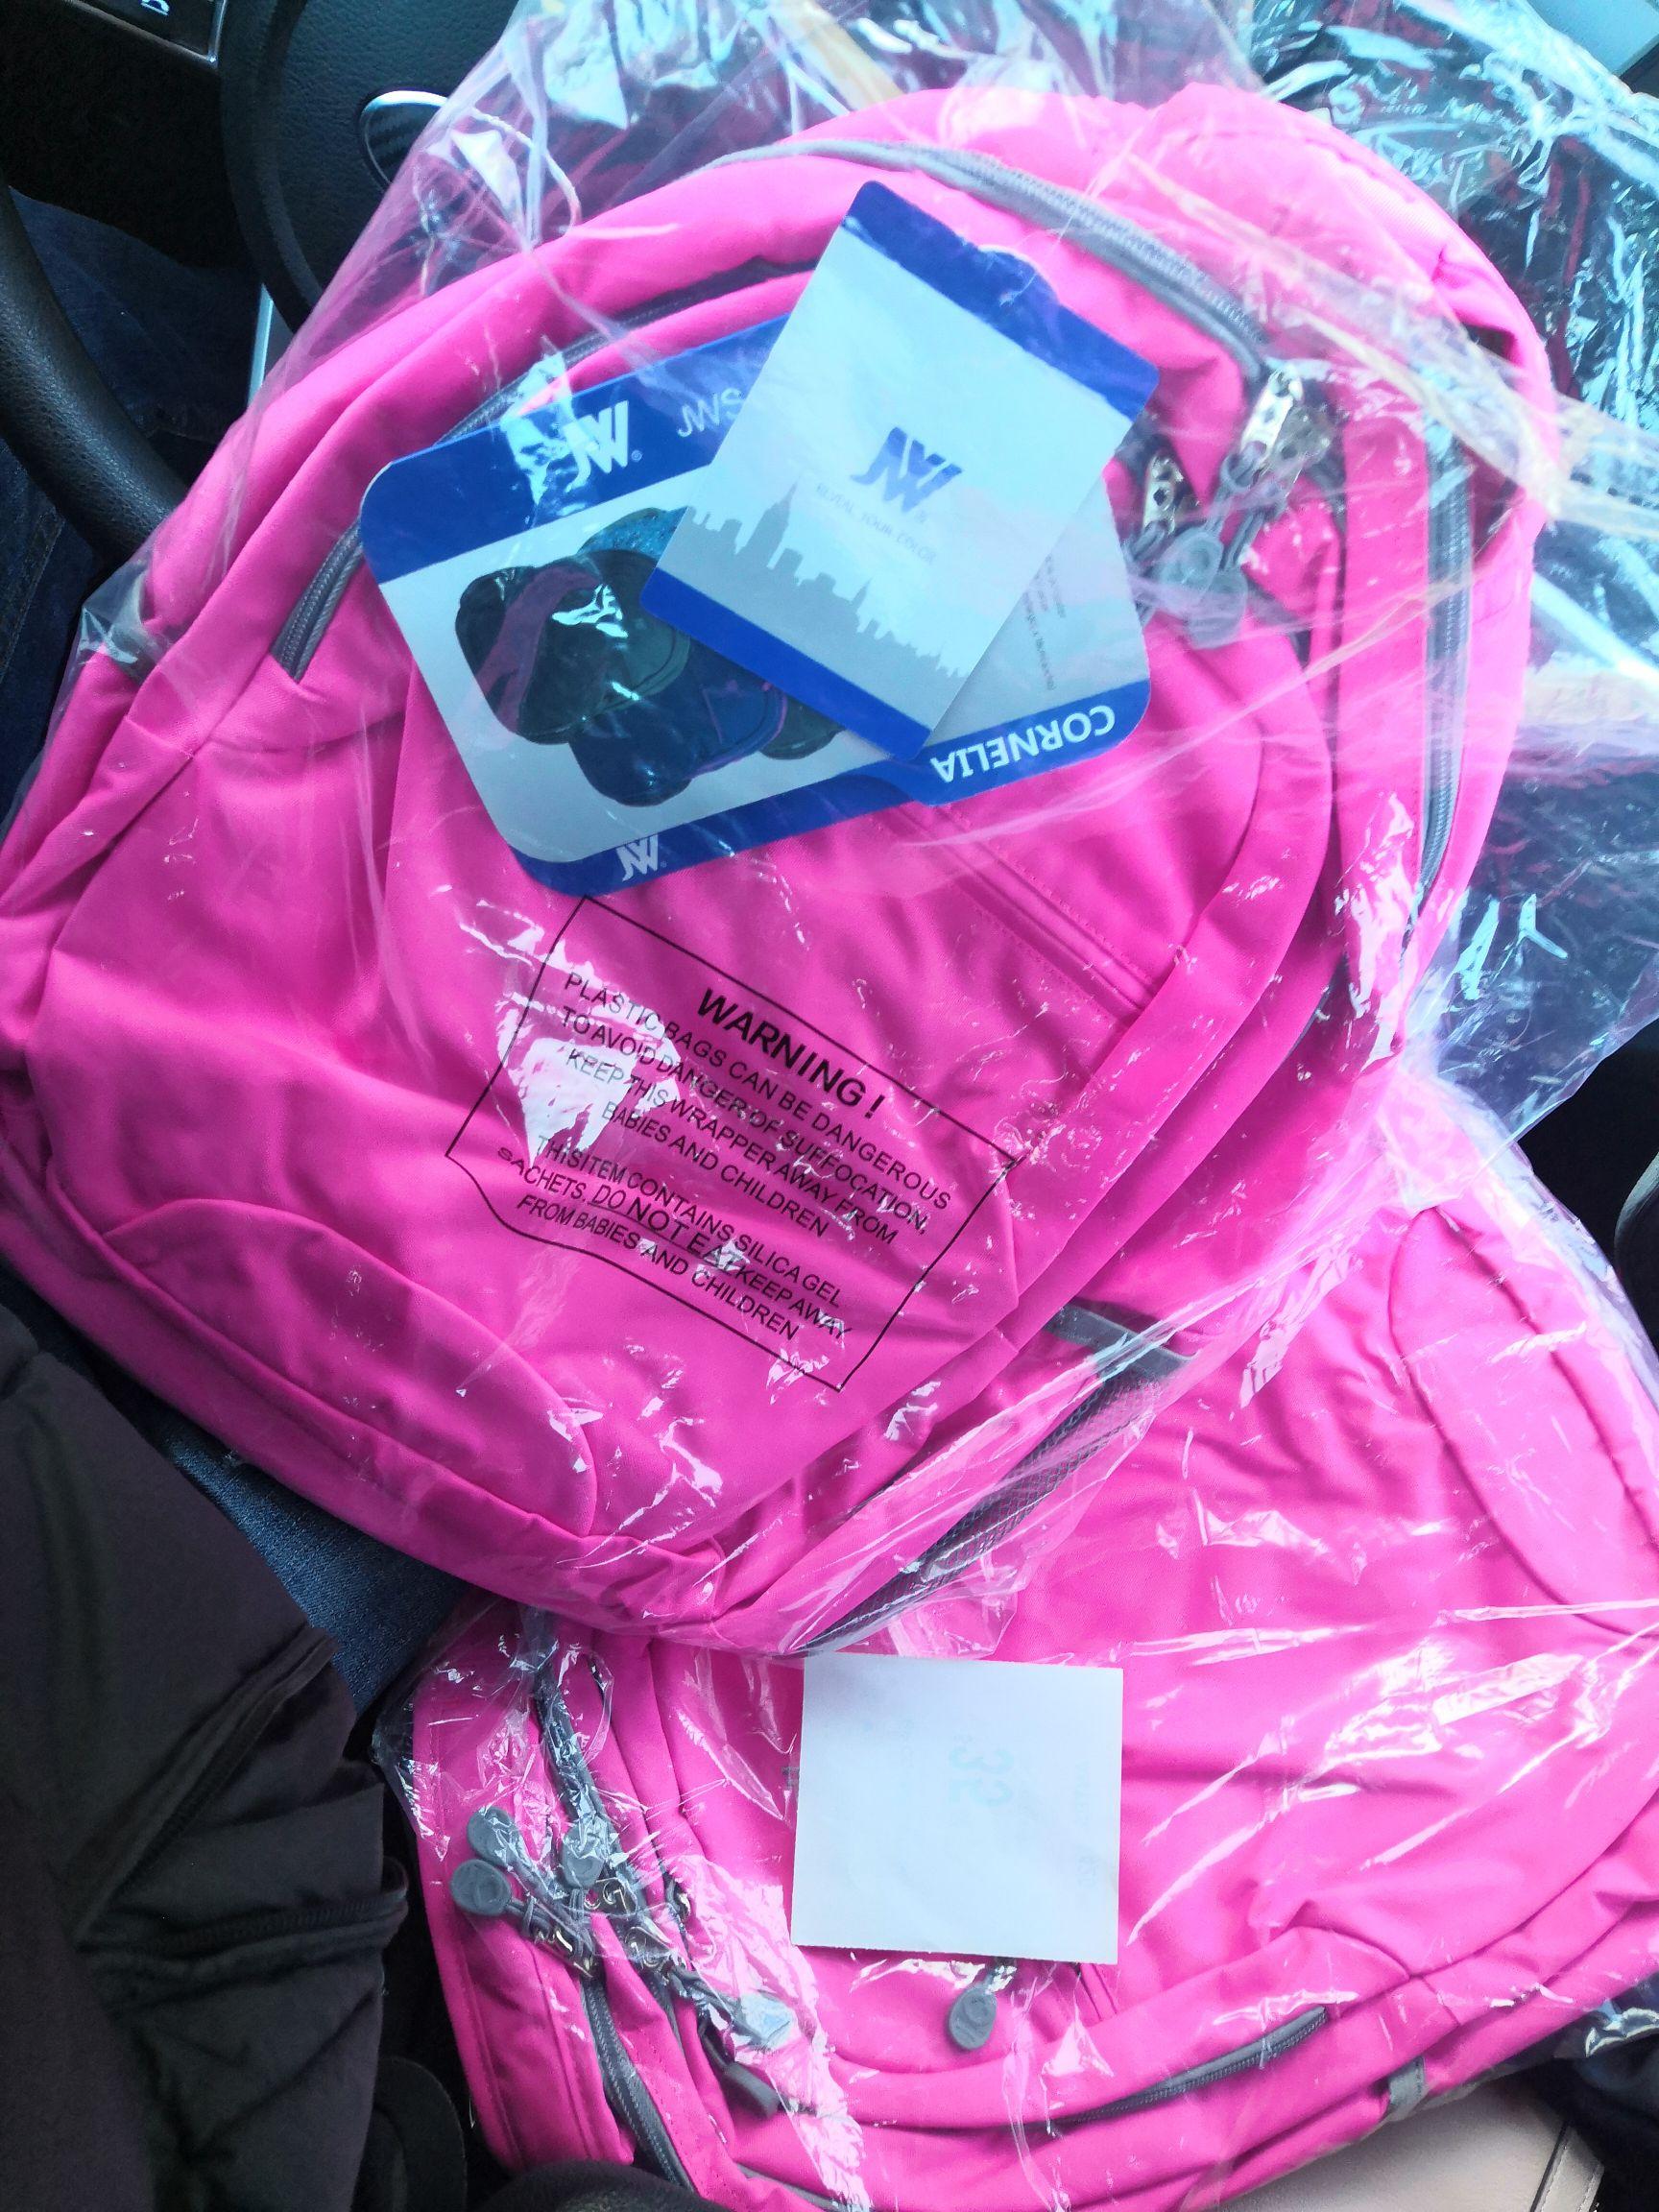 Walmart slp : Mochila rosa